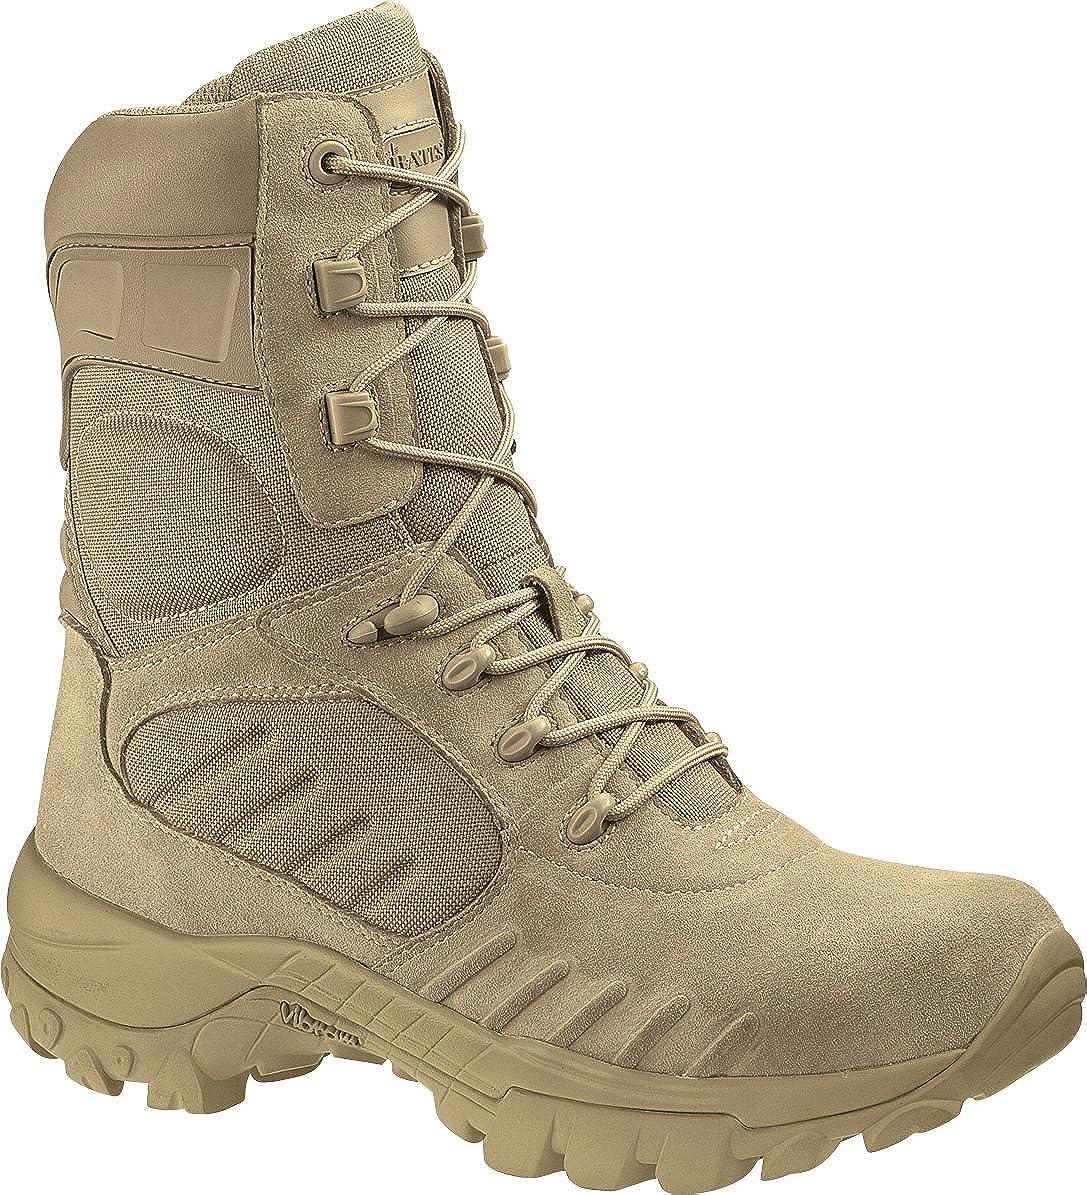 New product Bates Men's Super popular specialty store M-9 Desert Boot